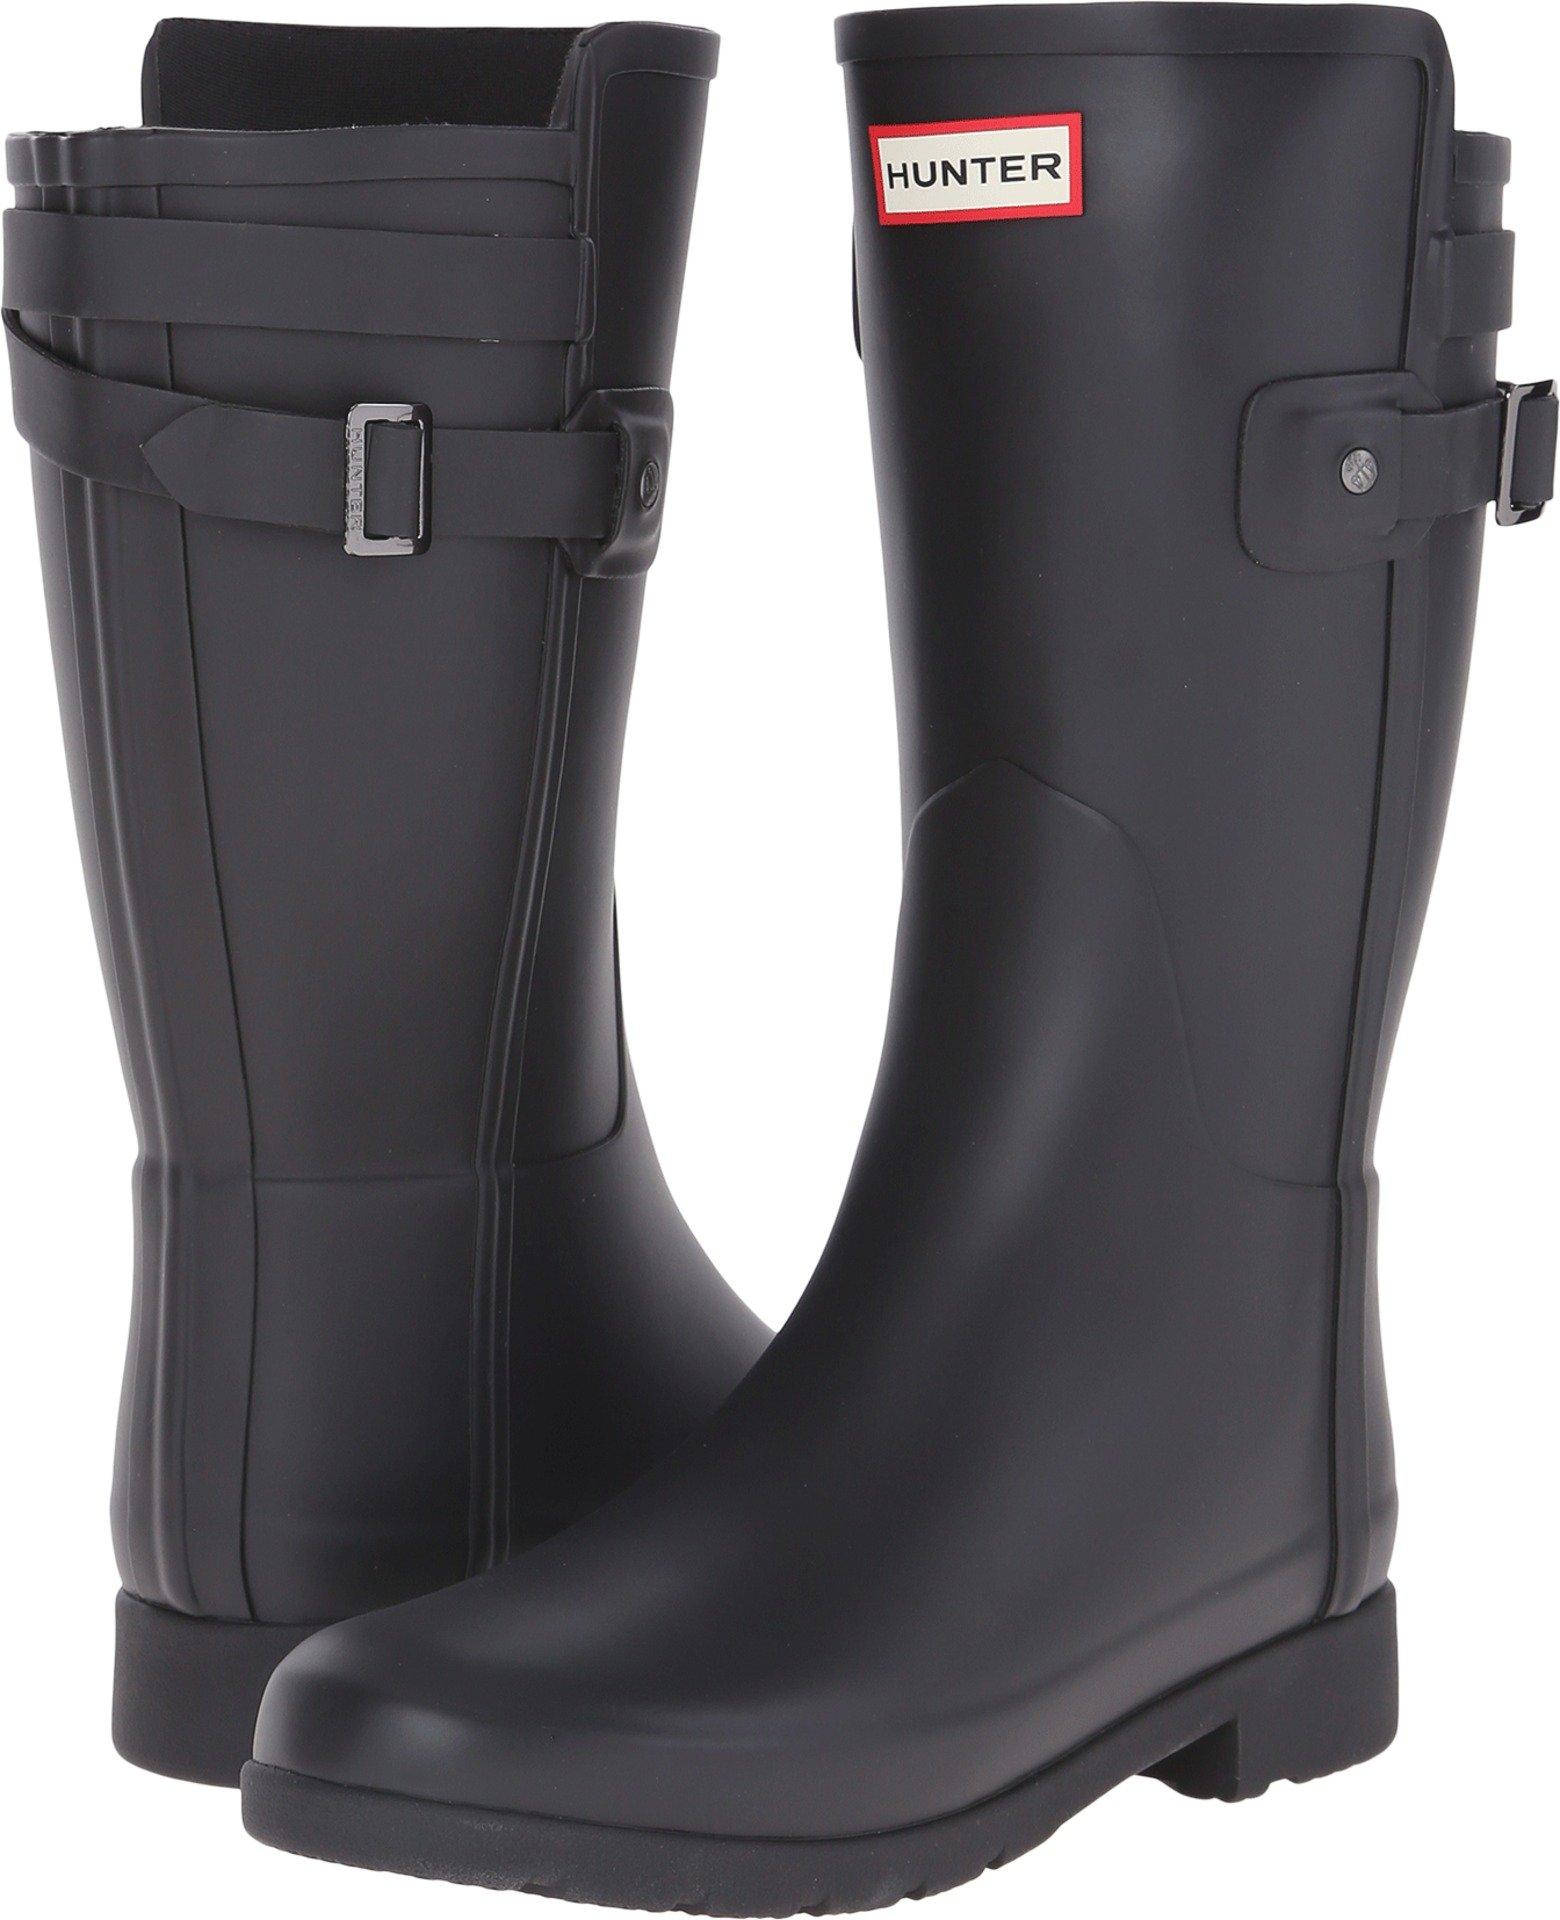 Hunter Women's Original Short Refined Back Strap Rain Boots Black 9 M US